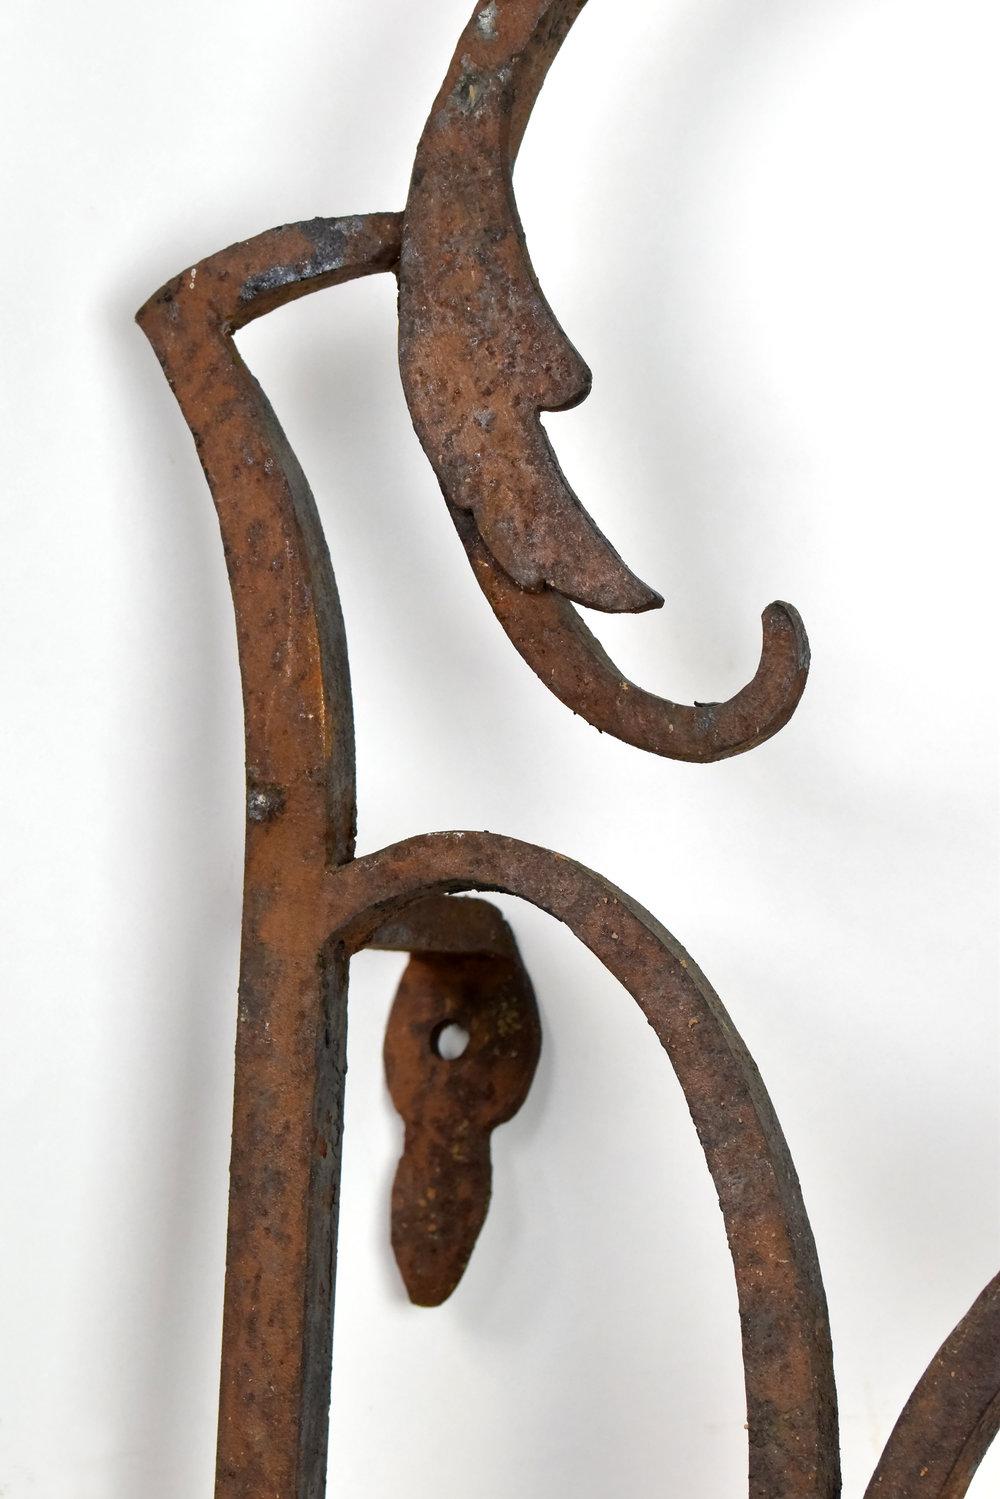 47506-hand-wrought-beaux-arts-iron-window-guard-metal.jpg